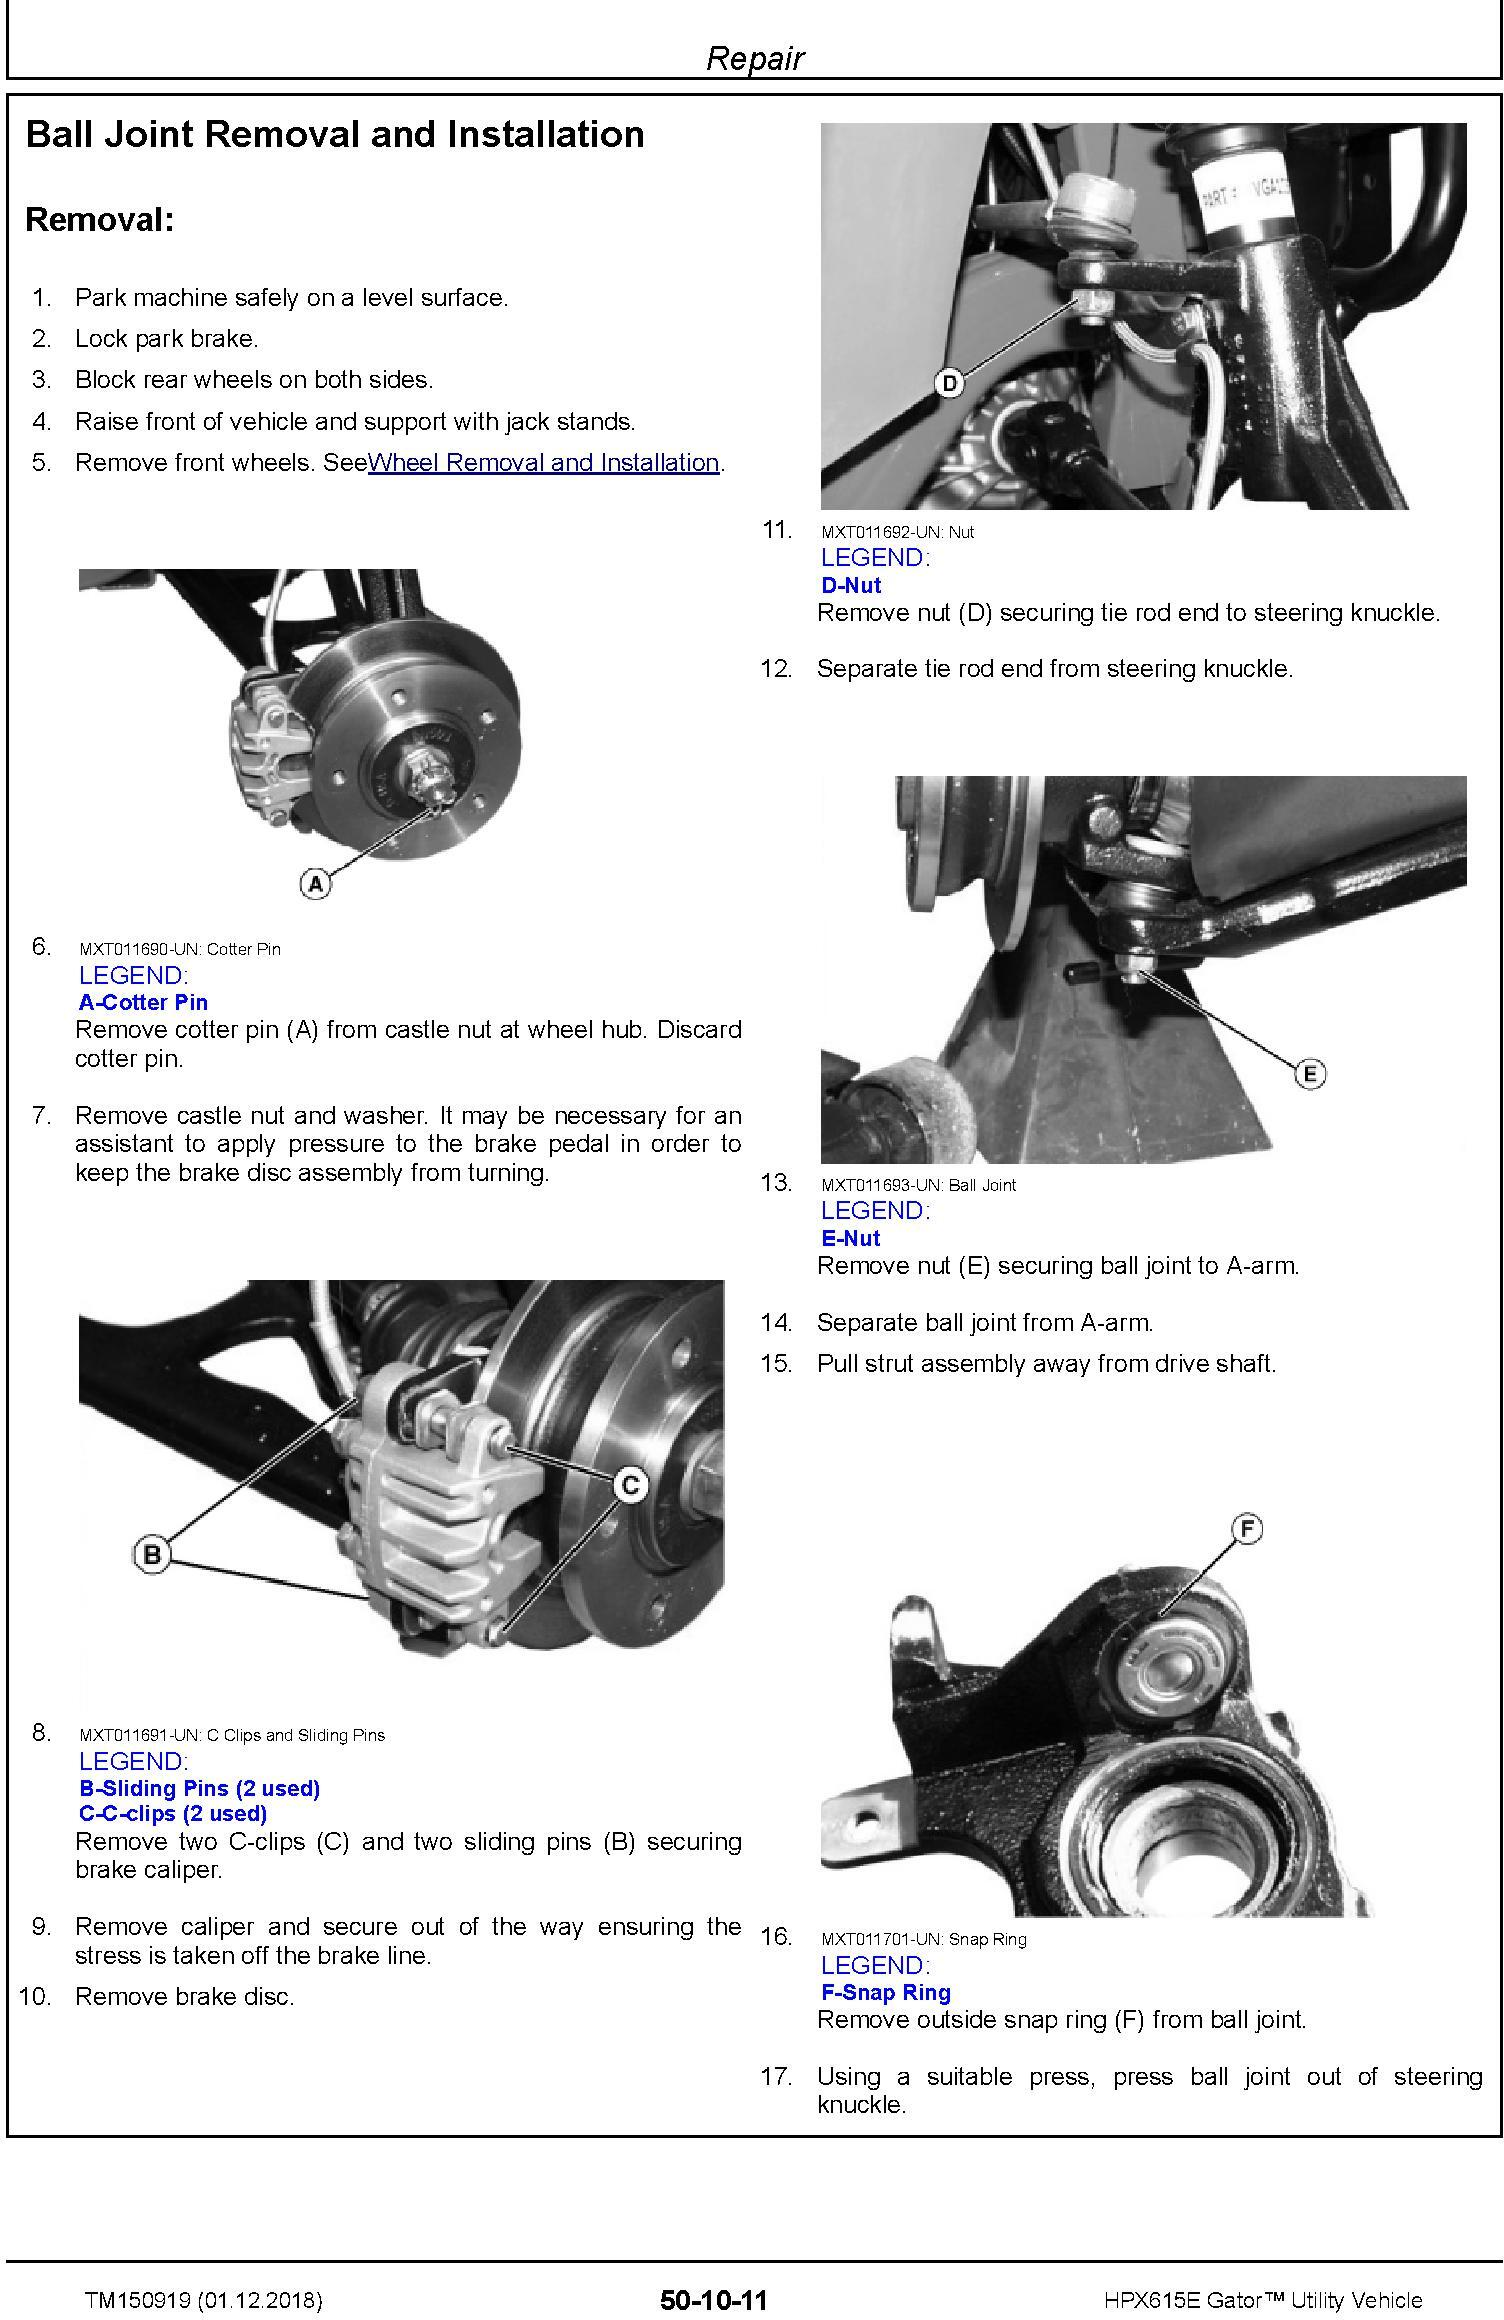 John Deere HPX615E Gator Utility Vehicle (SN. 010001-) Technical Manual (TM150919) - 1